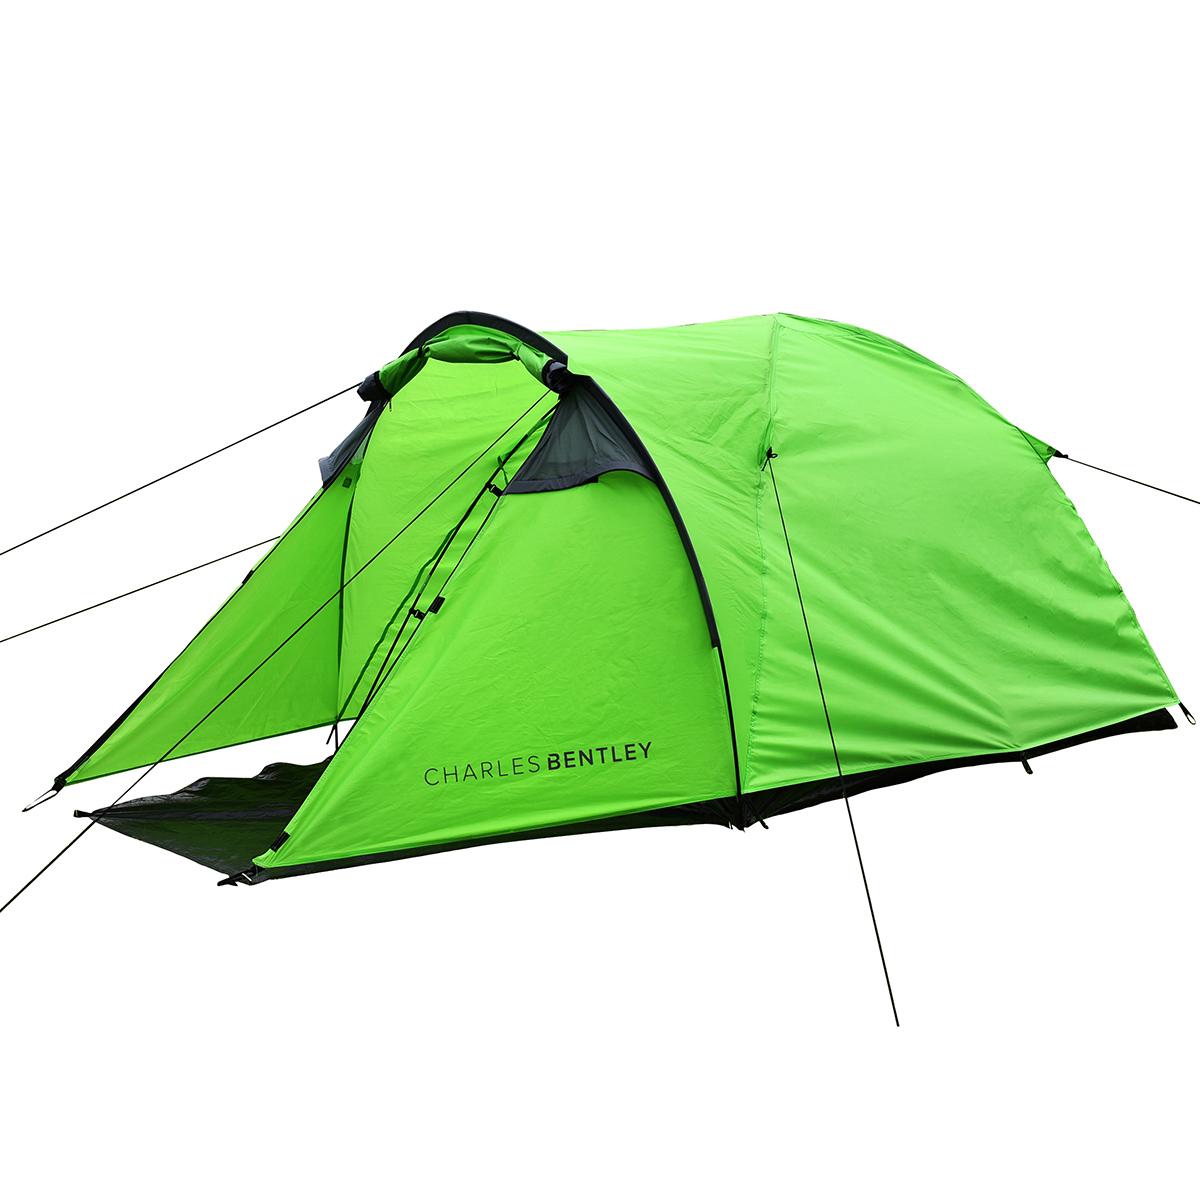 Details about Charles Bentley 2 Man Waterproof C&ing Tent u0026 Awning Built Outdoor - Grey  sc 1 st  eBay & Charles Bentley 2 Man Waterproof Camping Tent u0026 Awning Built Outdoor ...